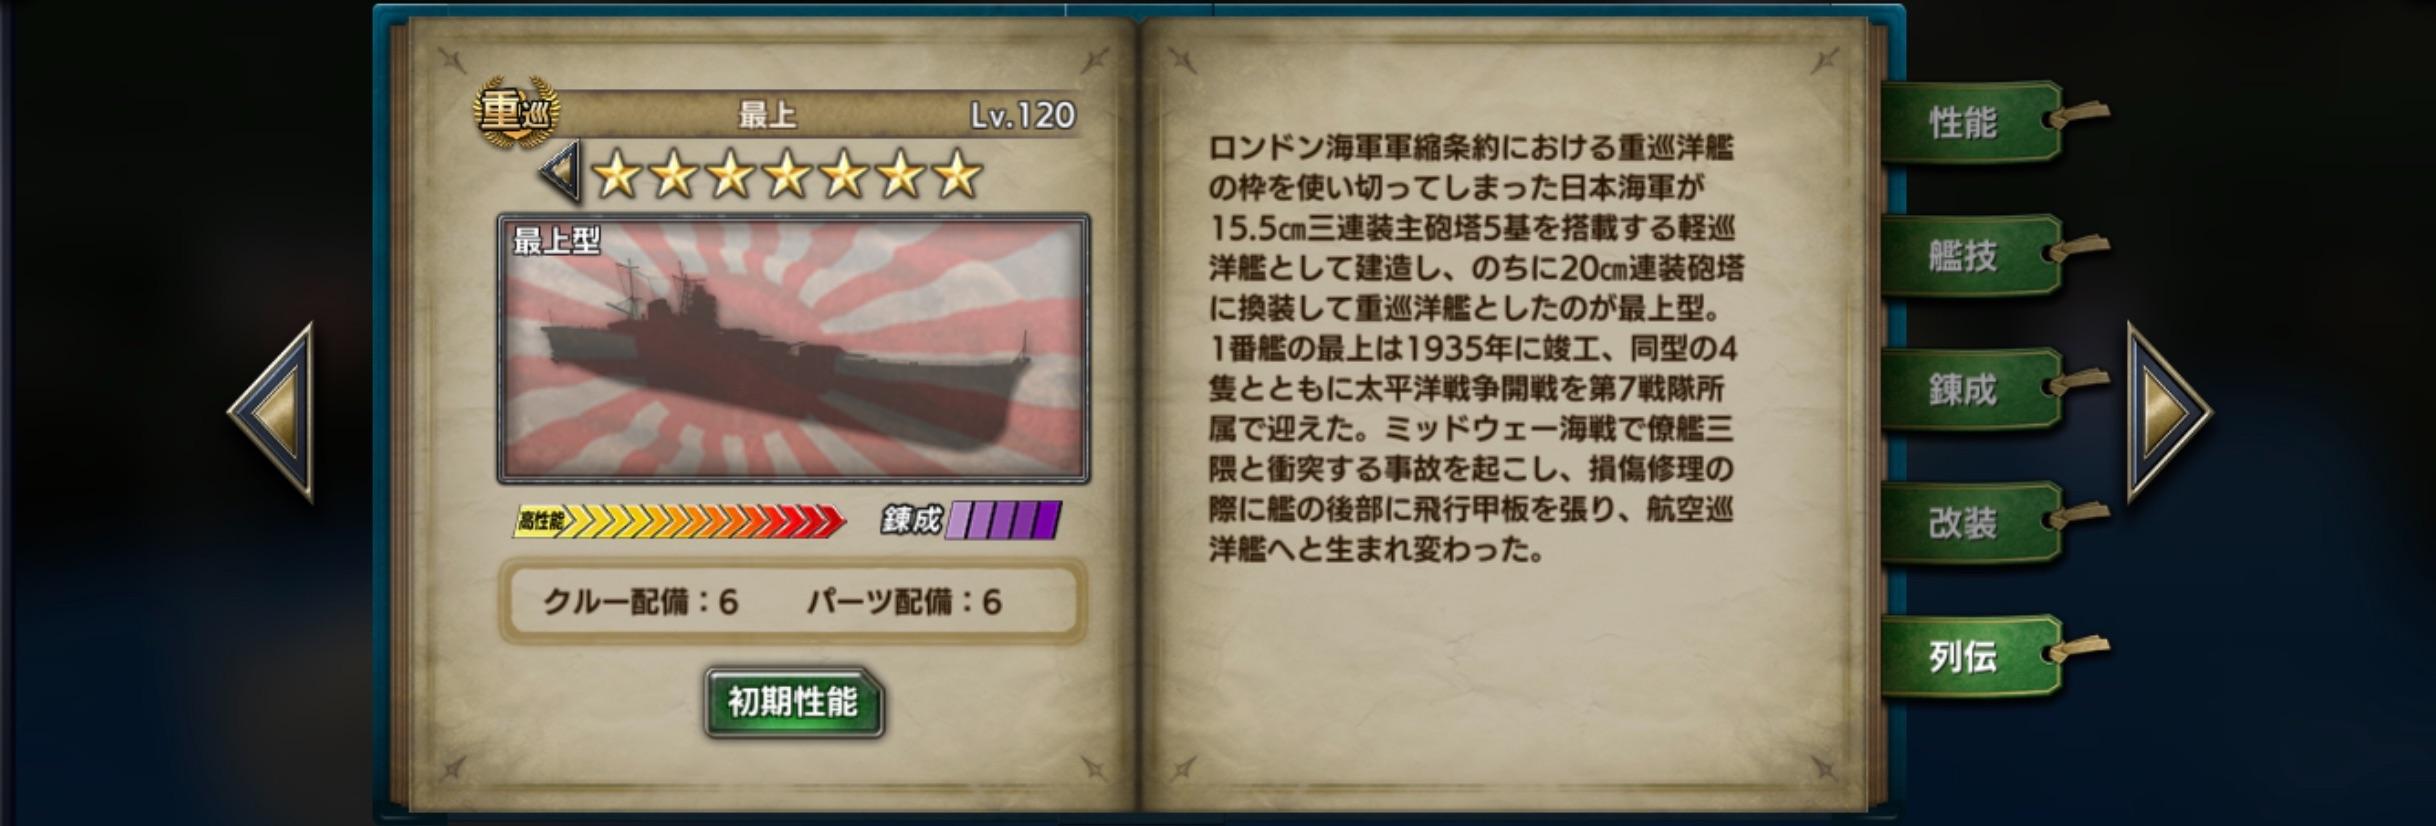 Mogami-history